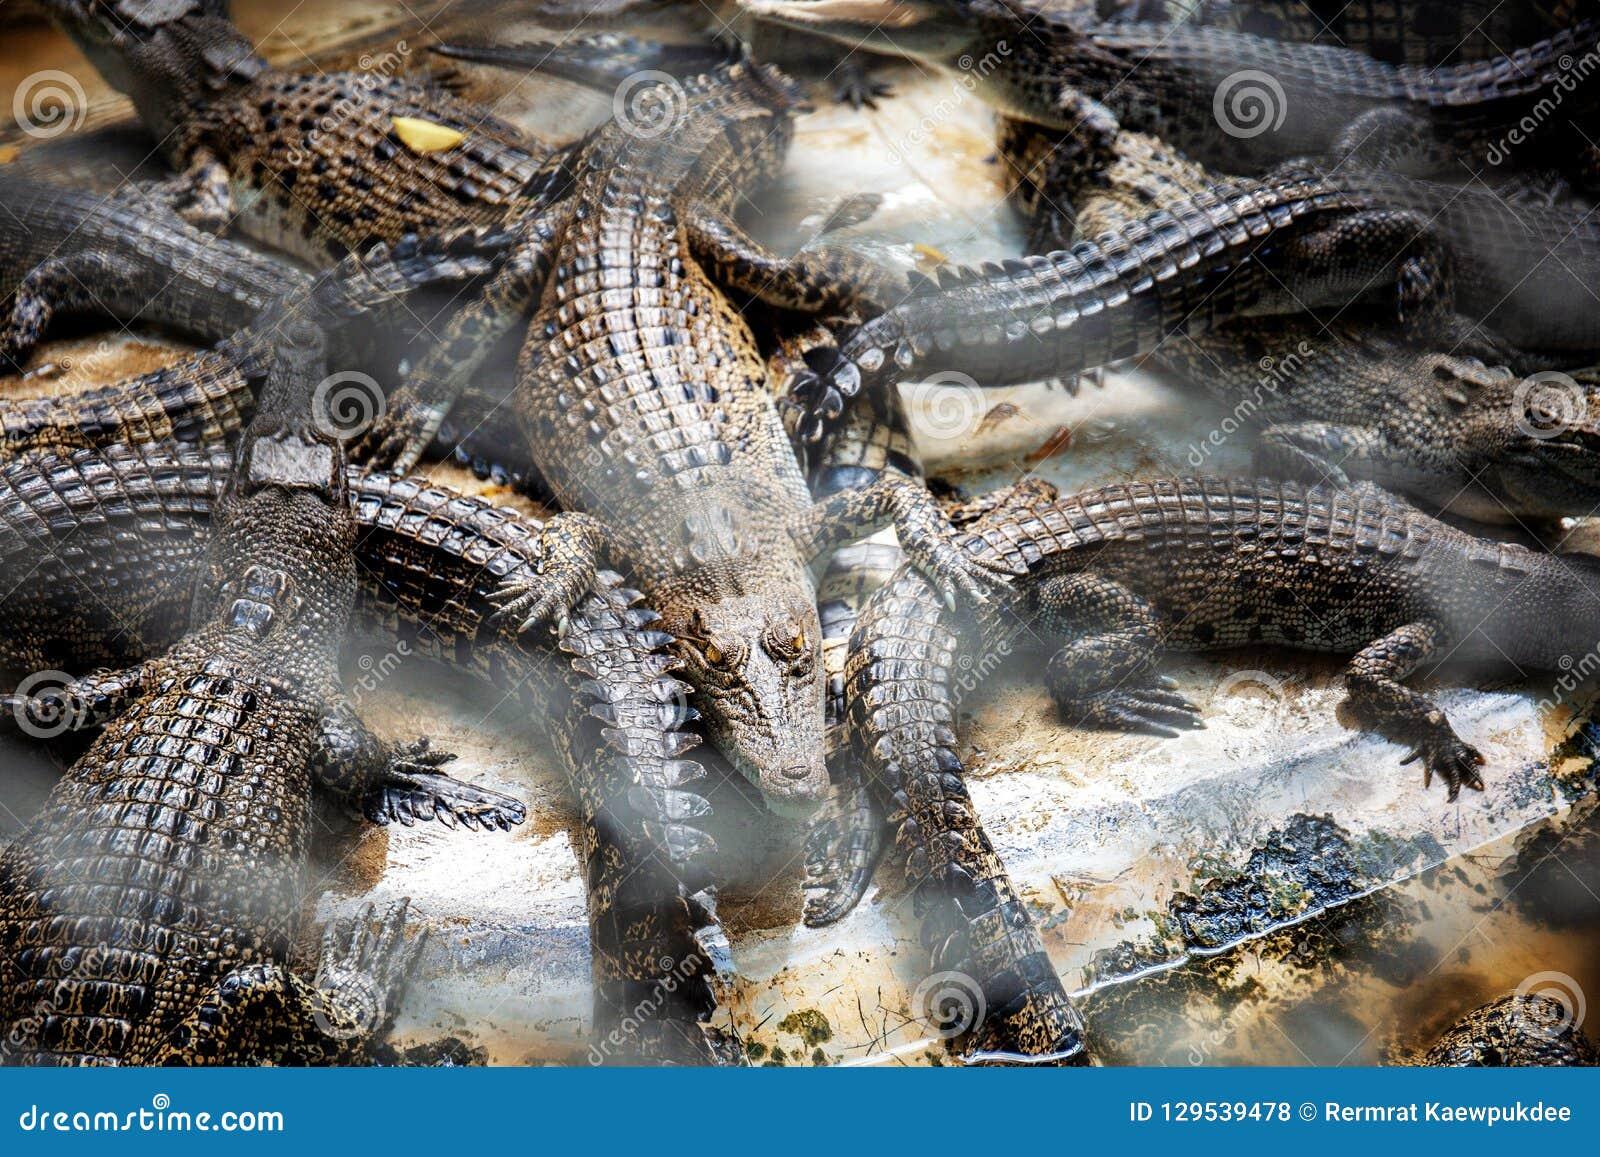 Crocodile in a farm.